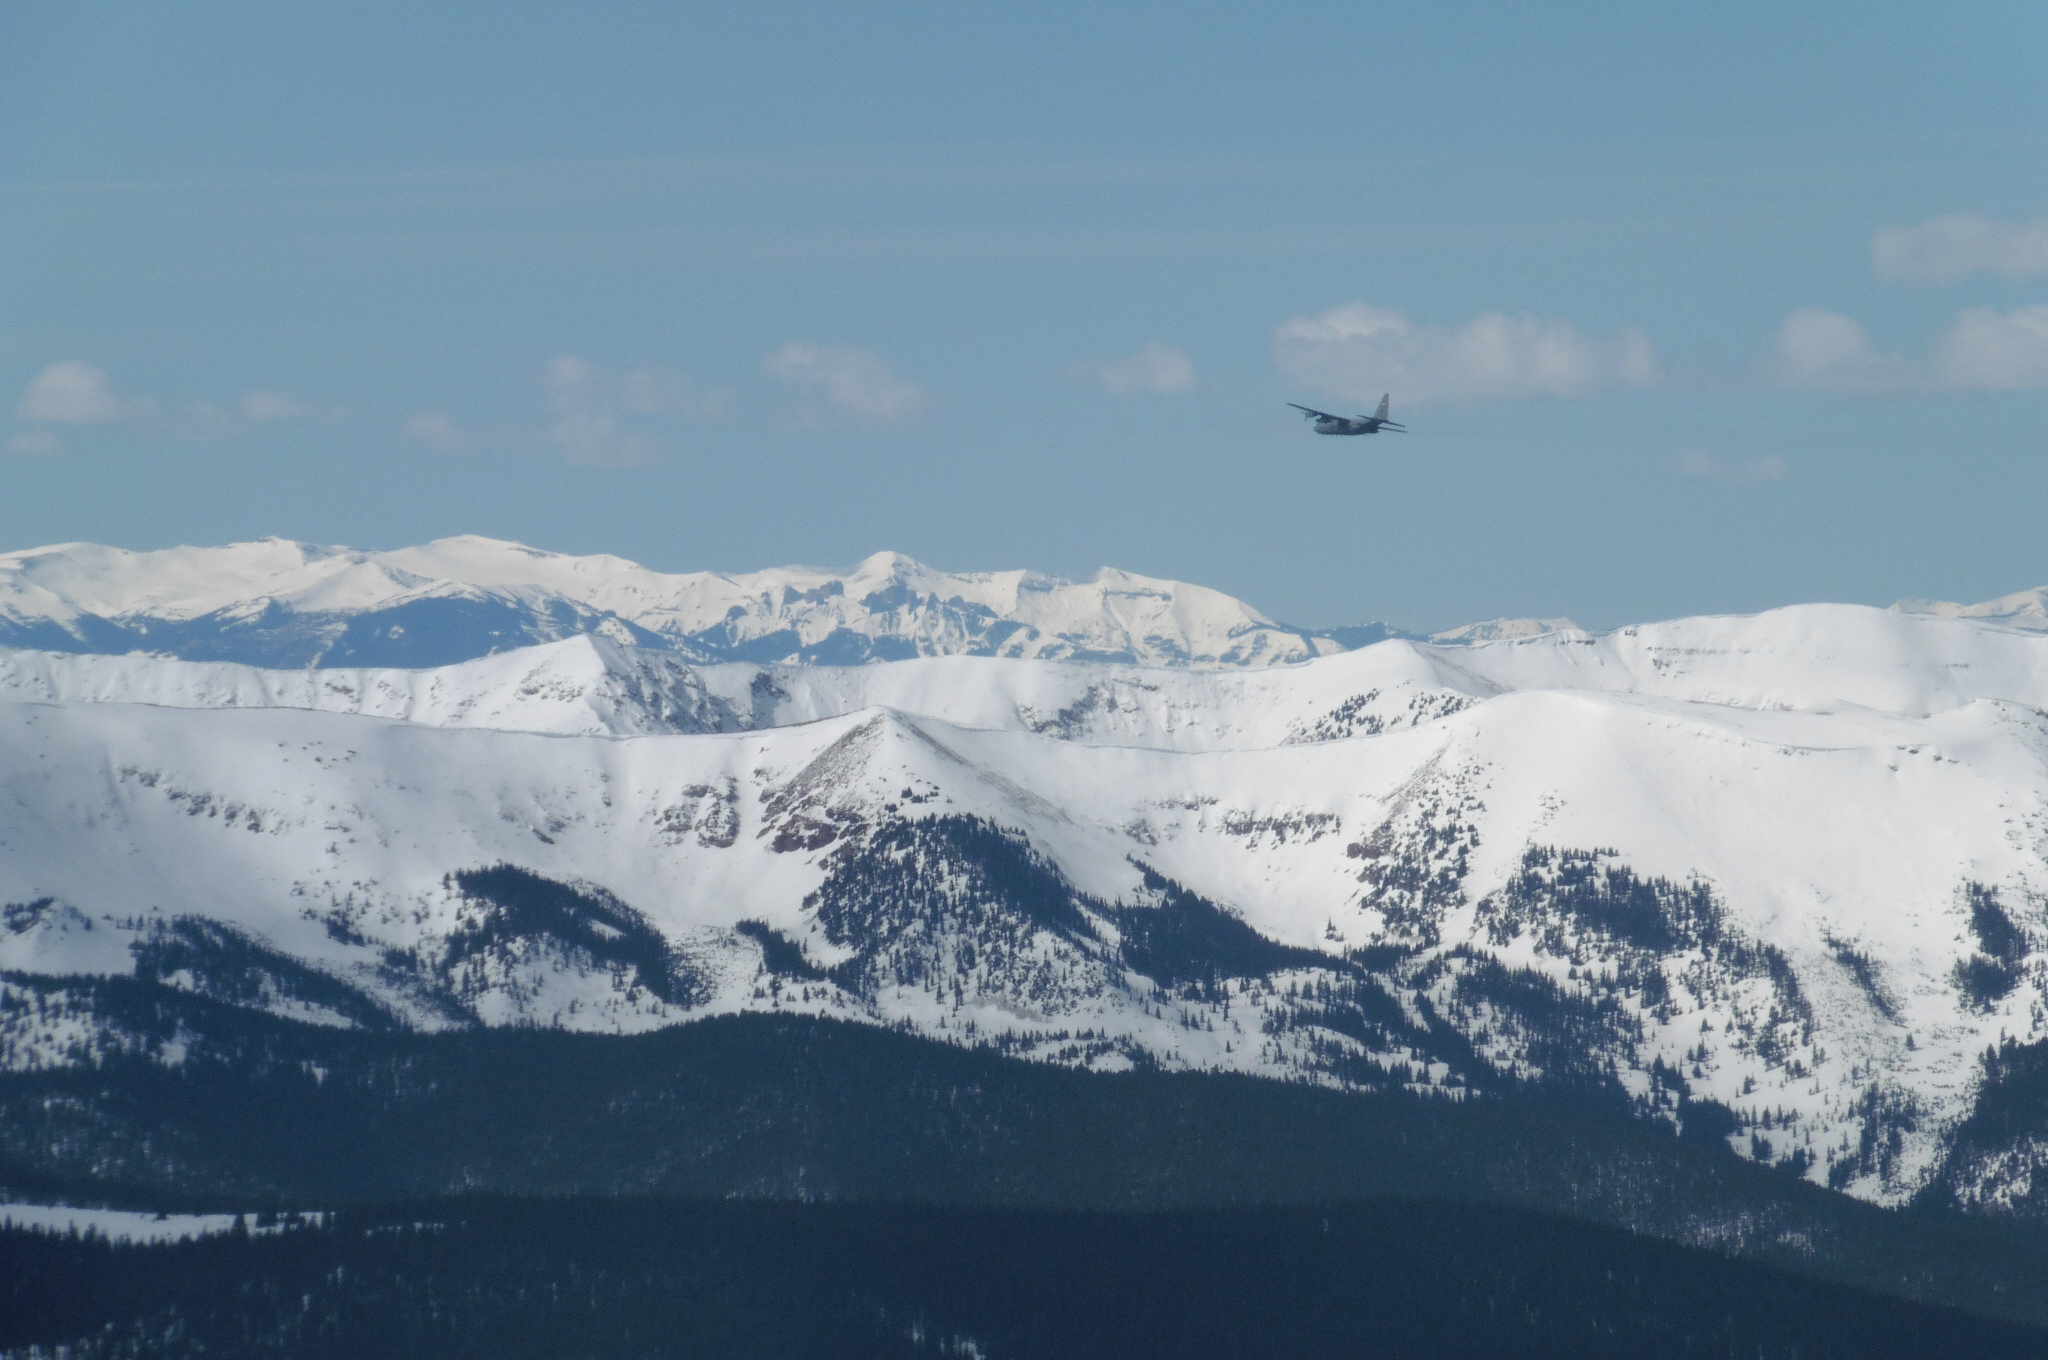 C130 buzzing the peaks